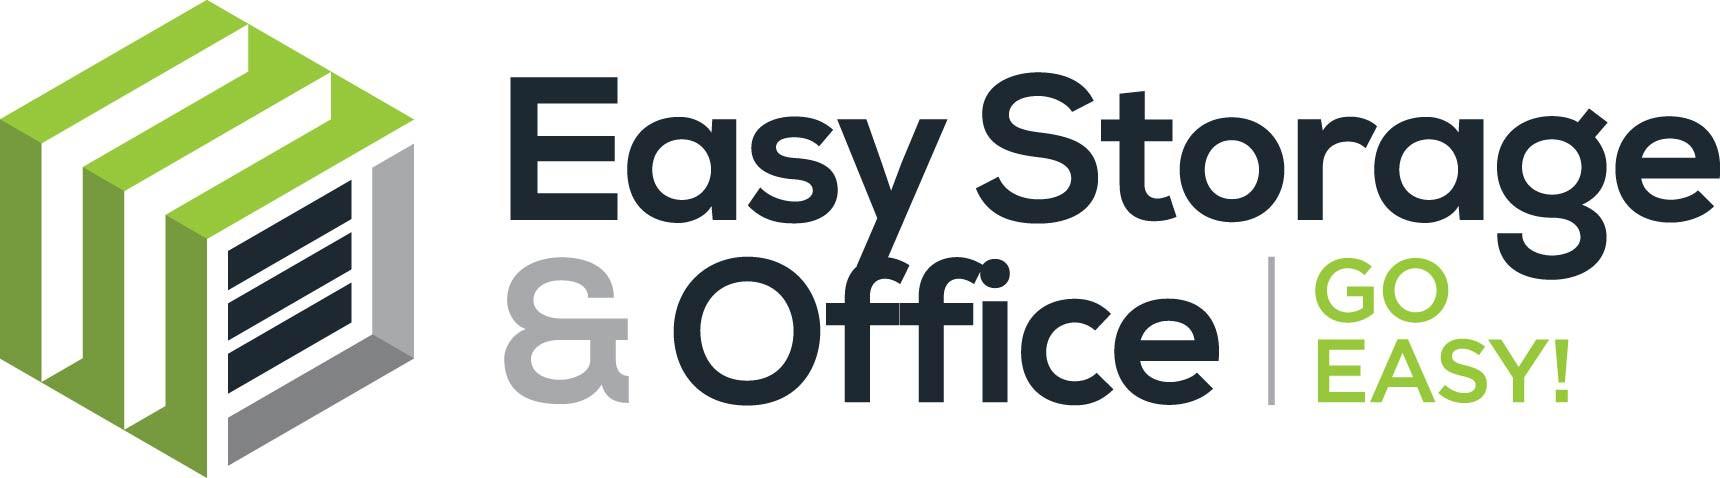 Easy Storage & Office